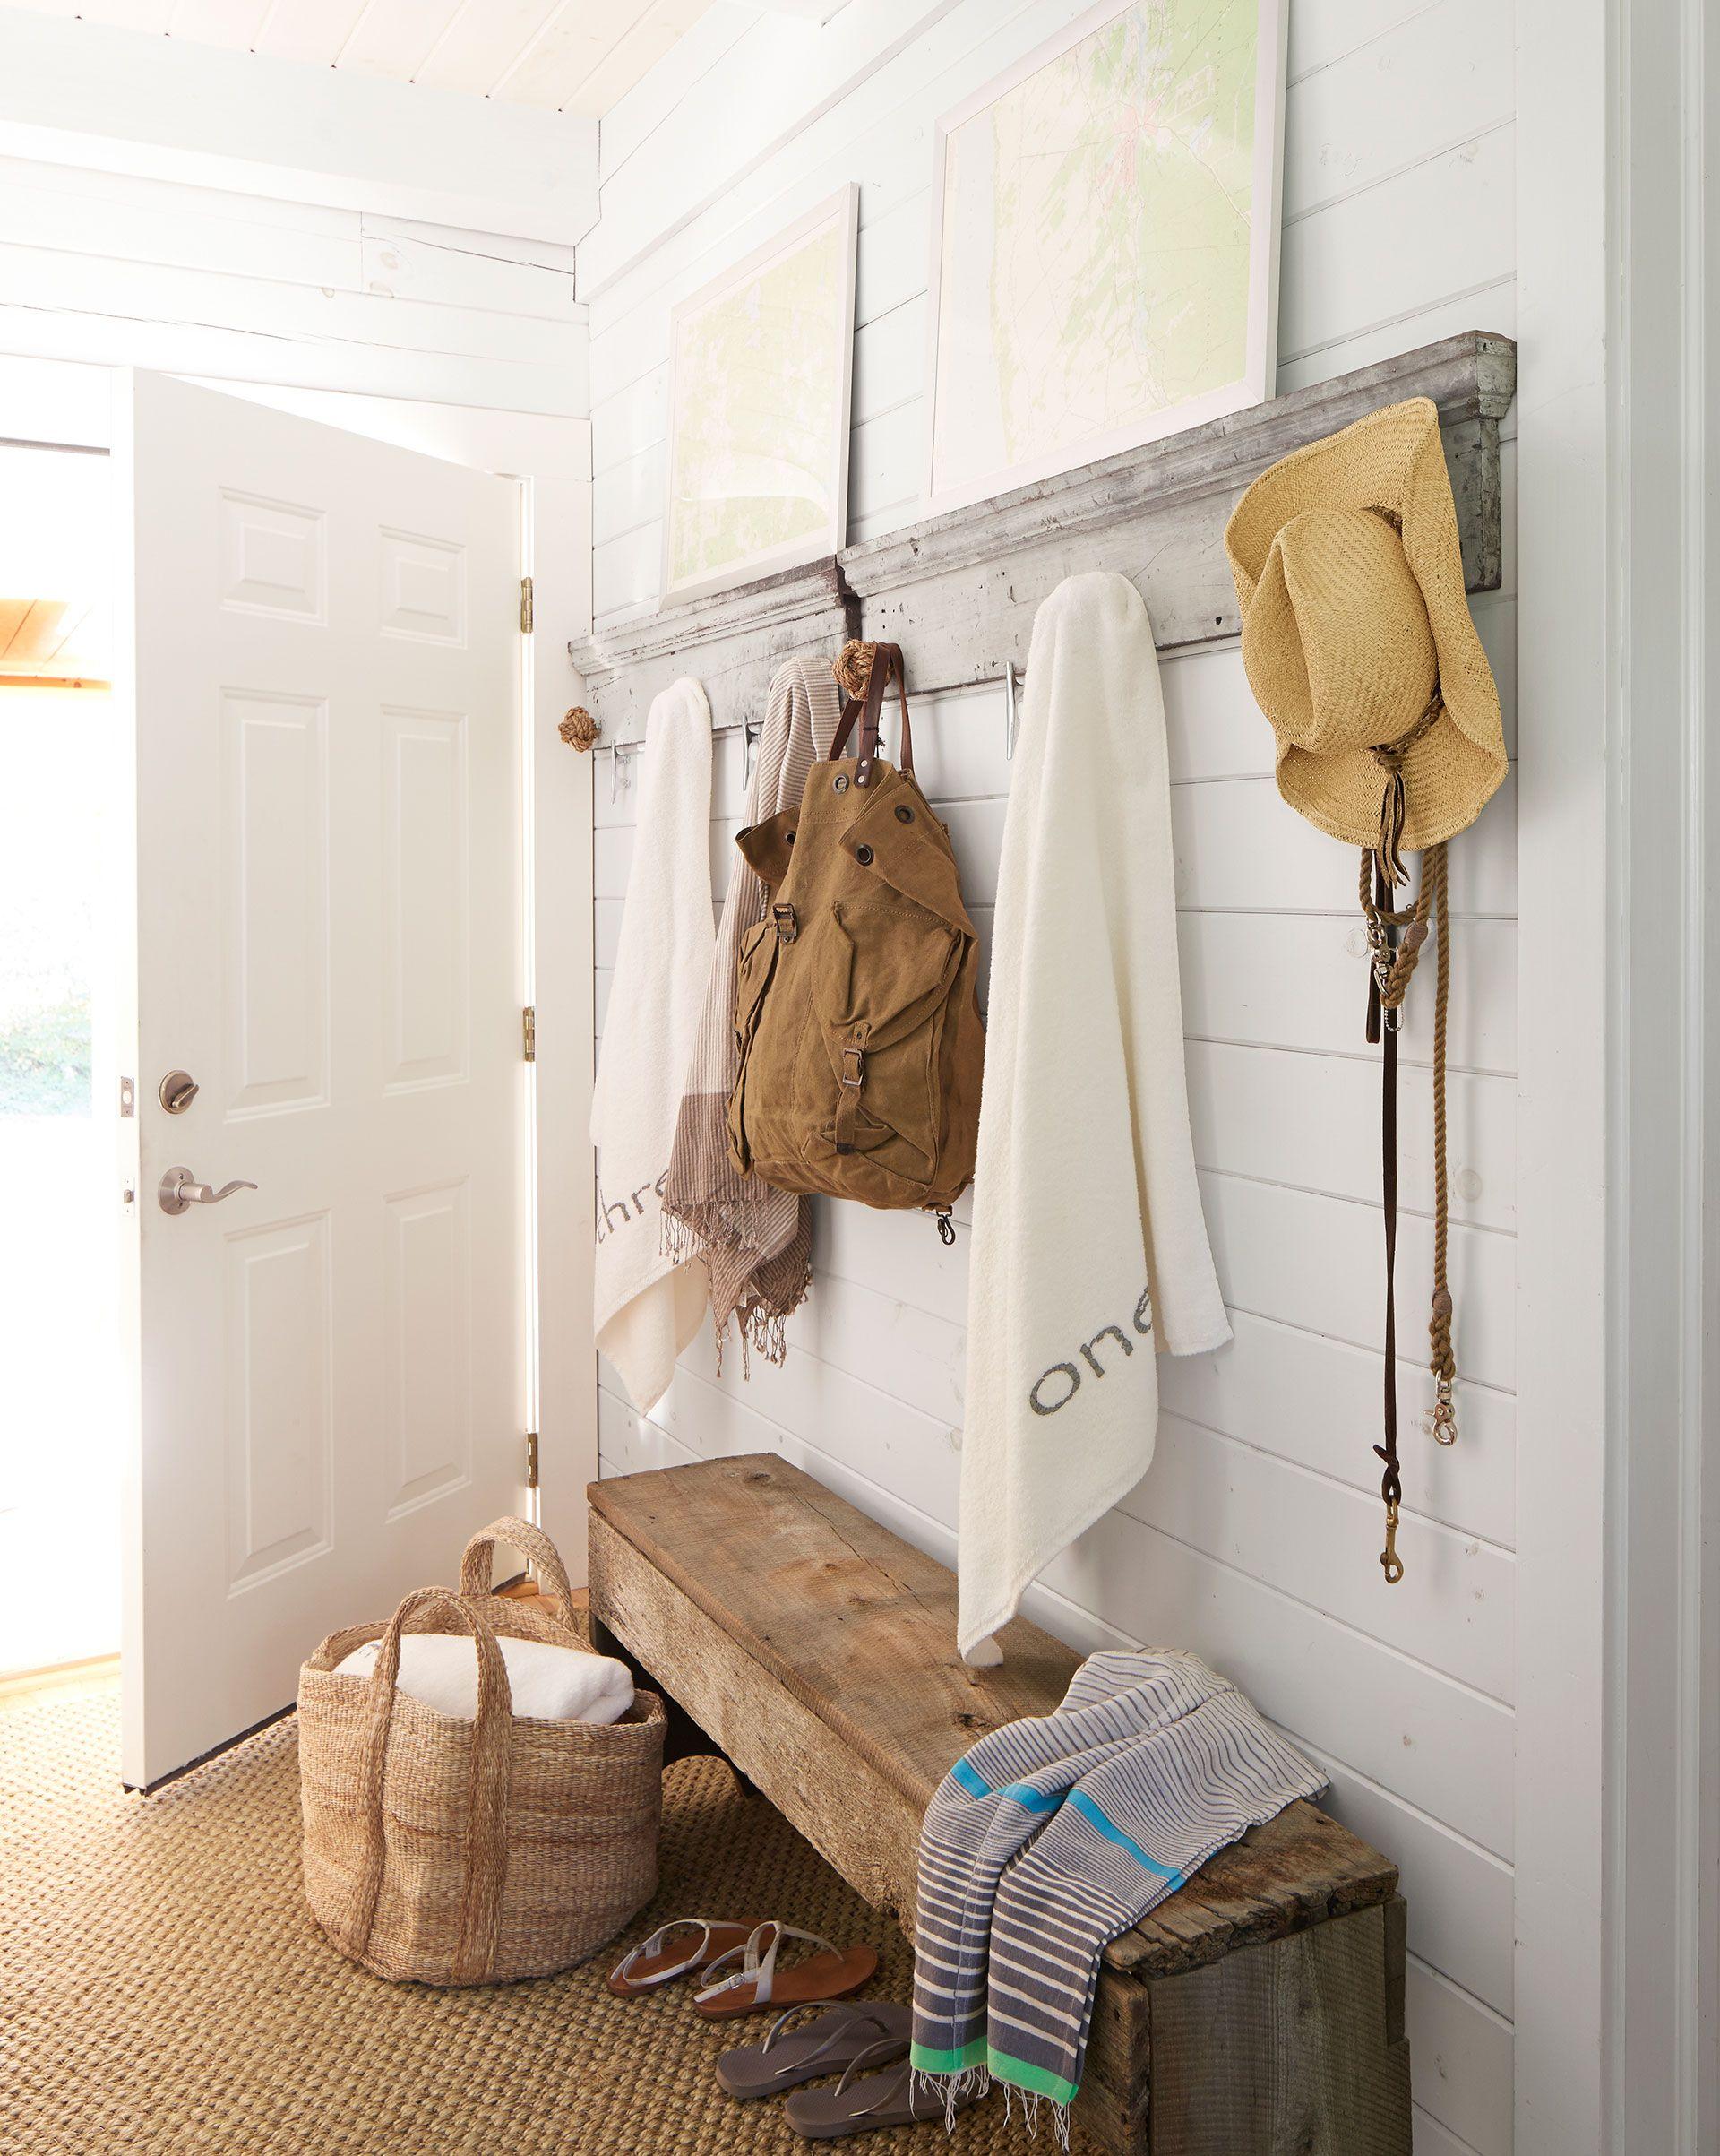 Mud Room Ideas Decorating a Mud or Laundry Room